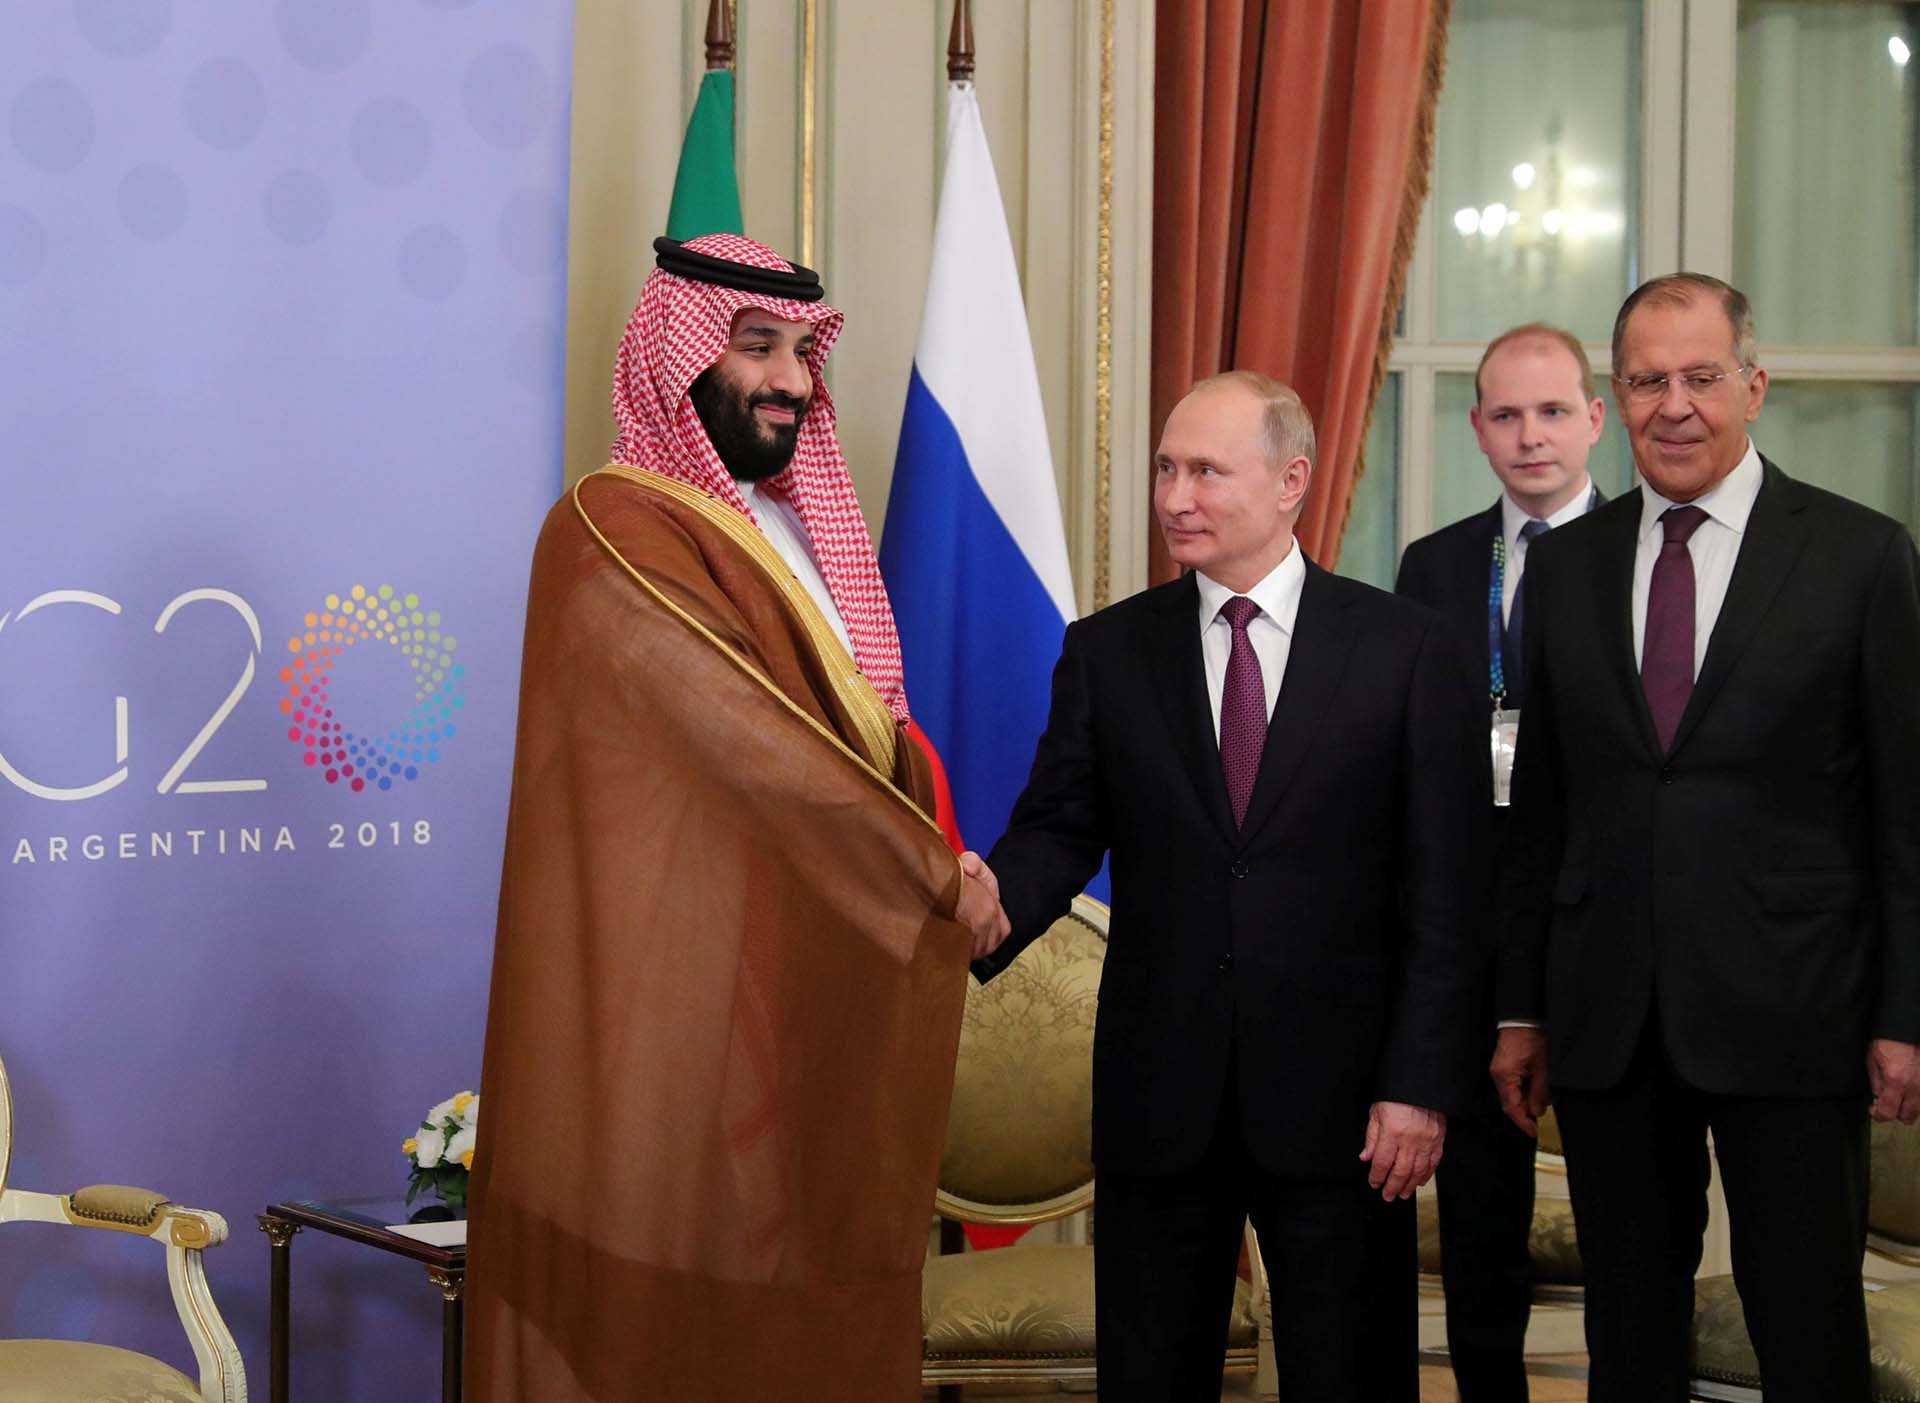 Putiny el príncipe de la corona sauditaMohammed bin Salman